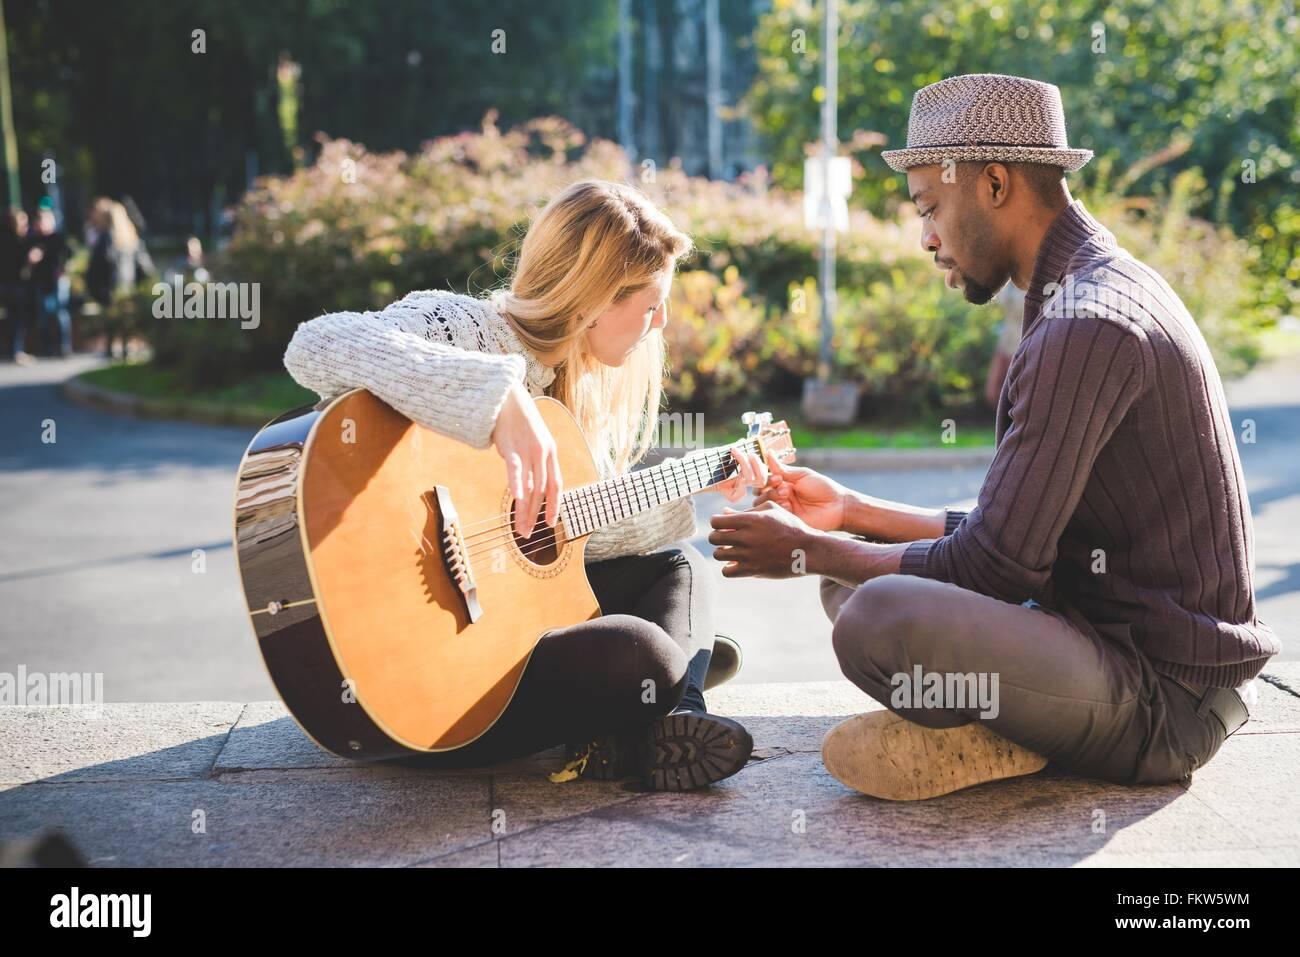 Paar im Park Gitarrespielen lernen Stockbild